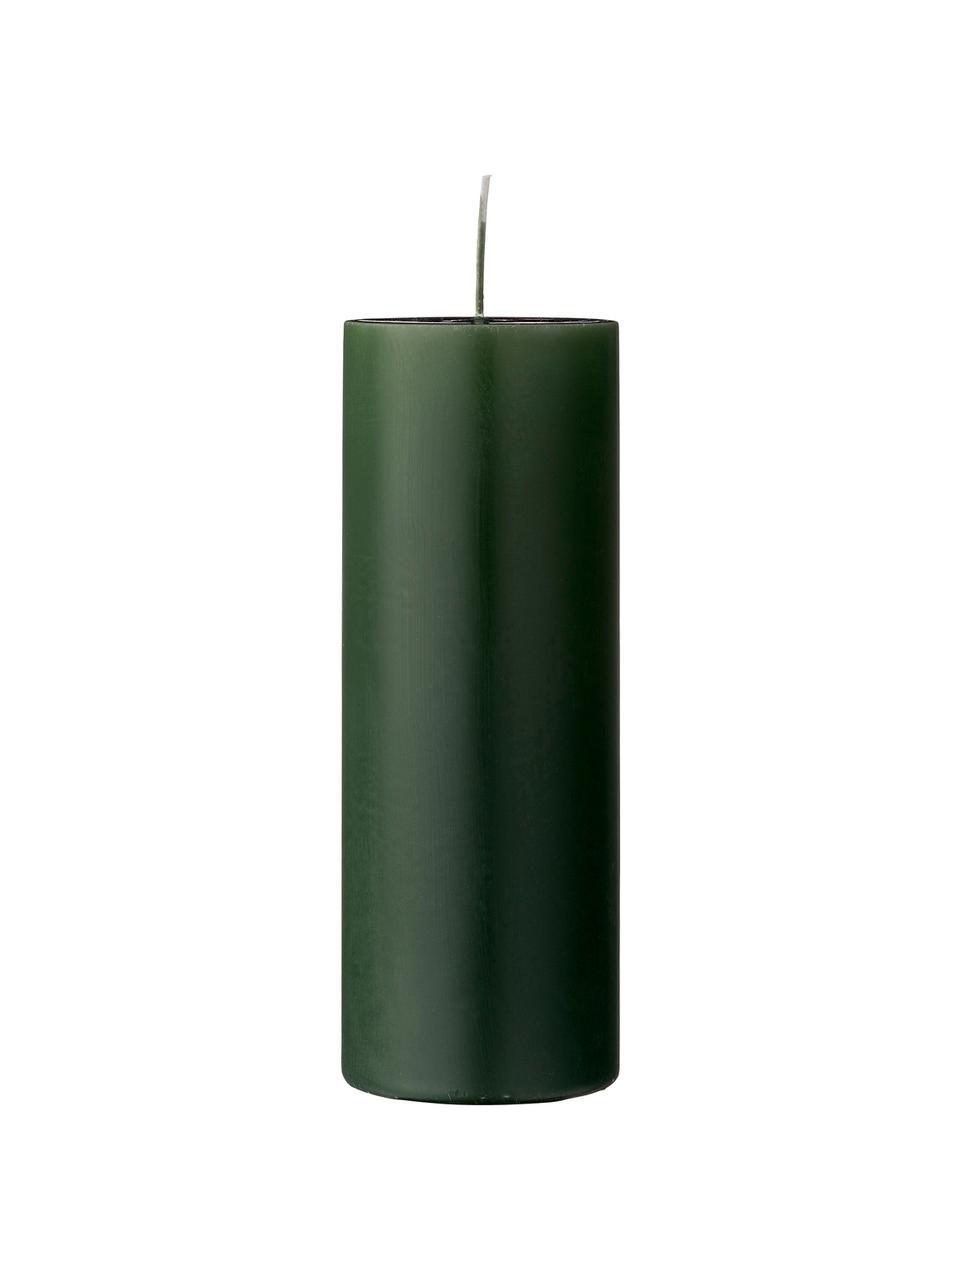 Bougie décorative verte Lulu, Vert forêt